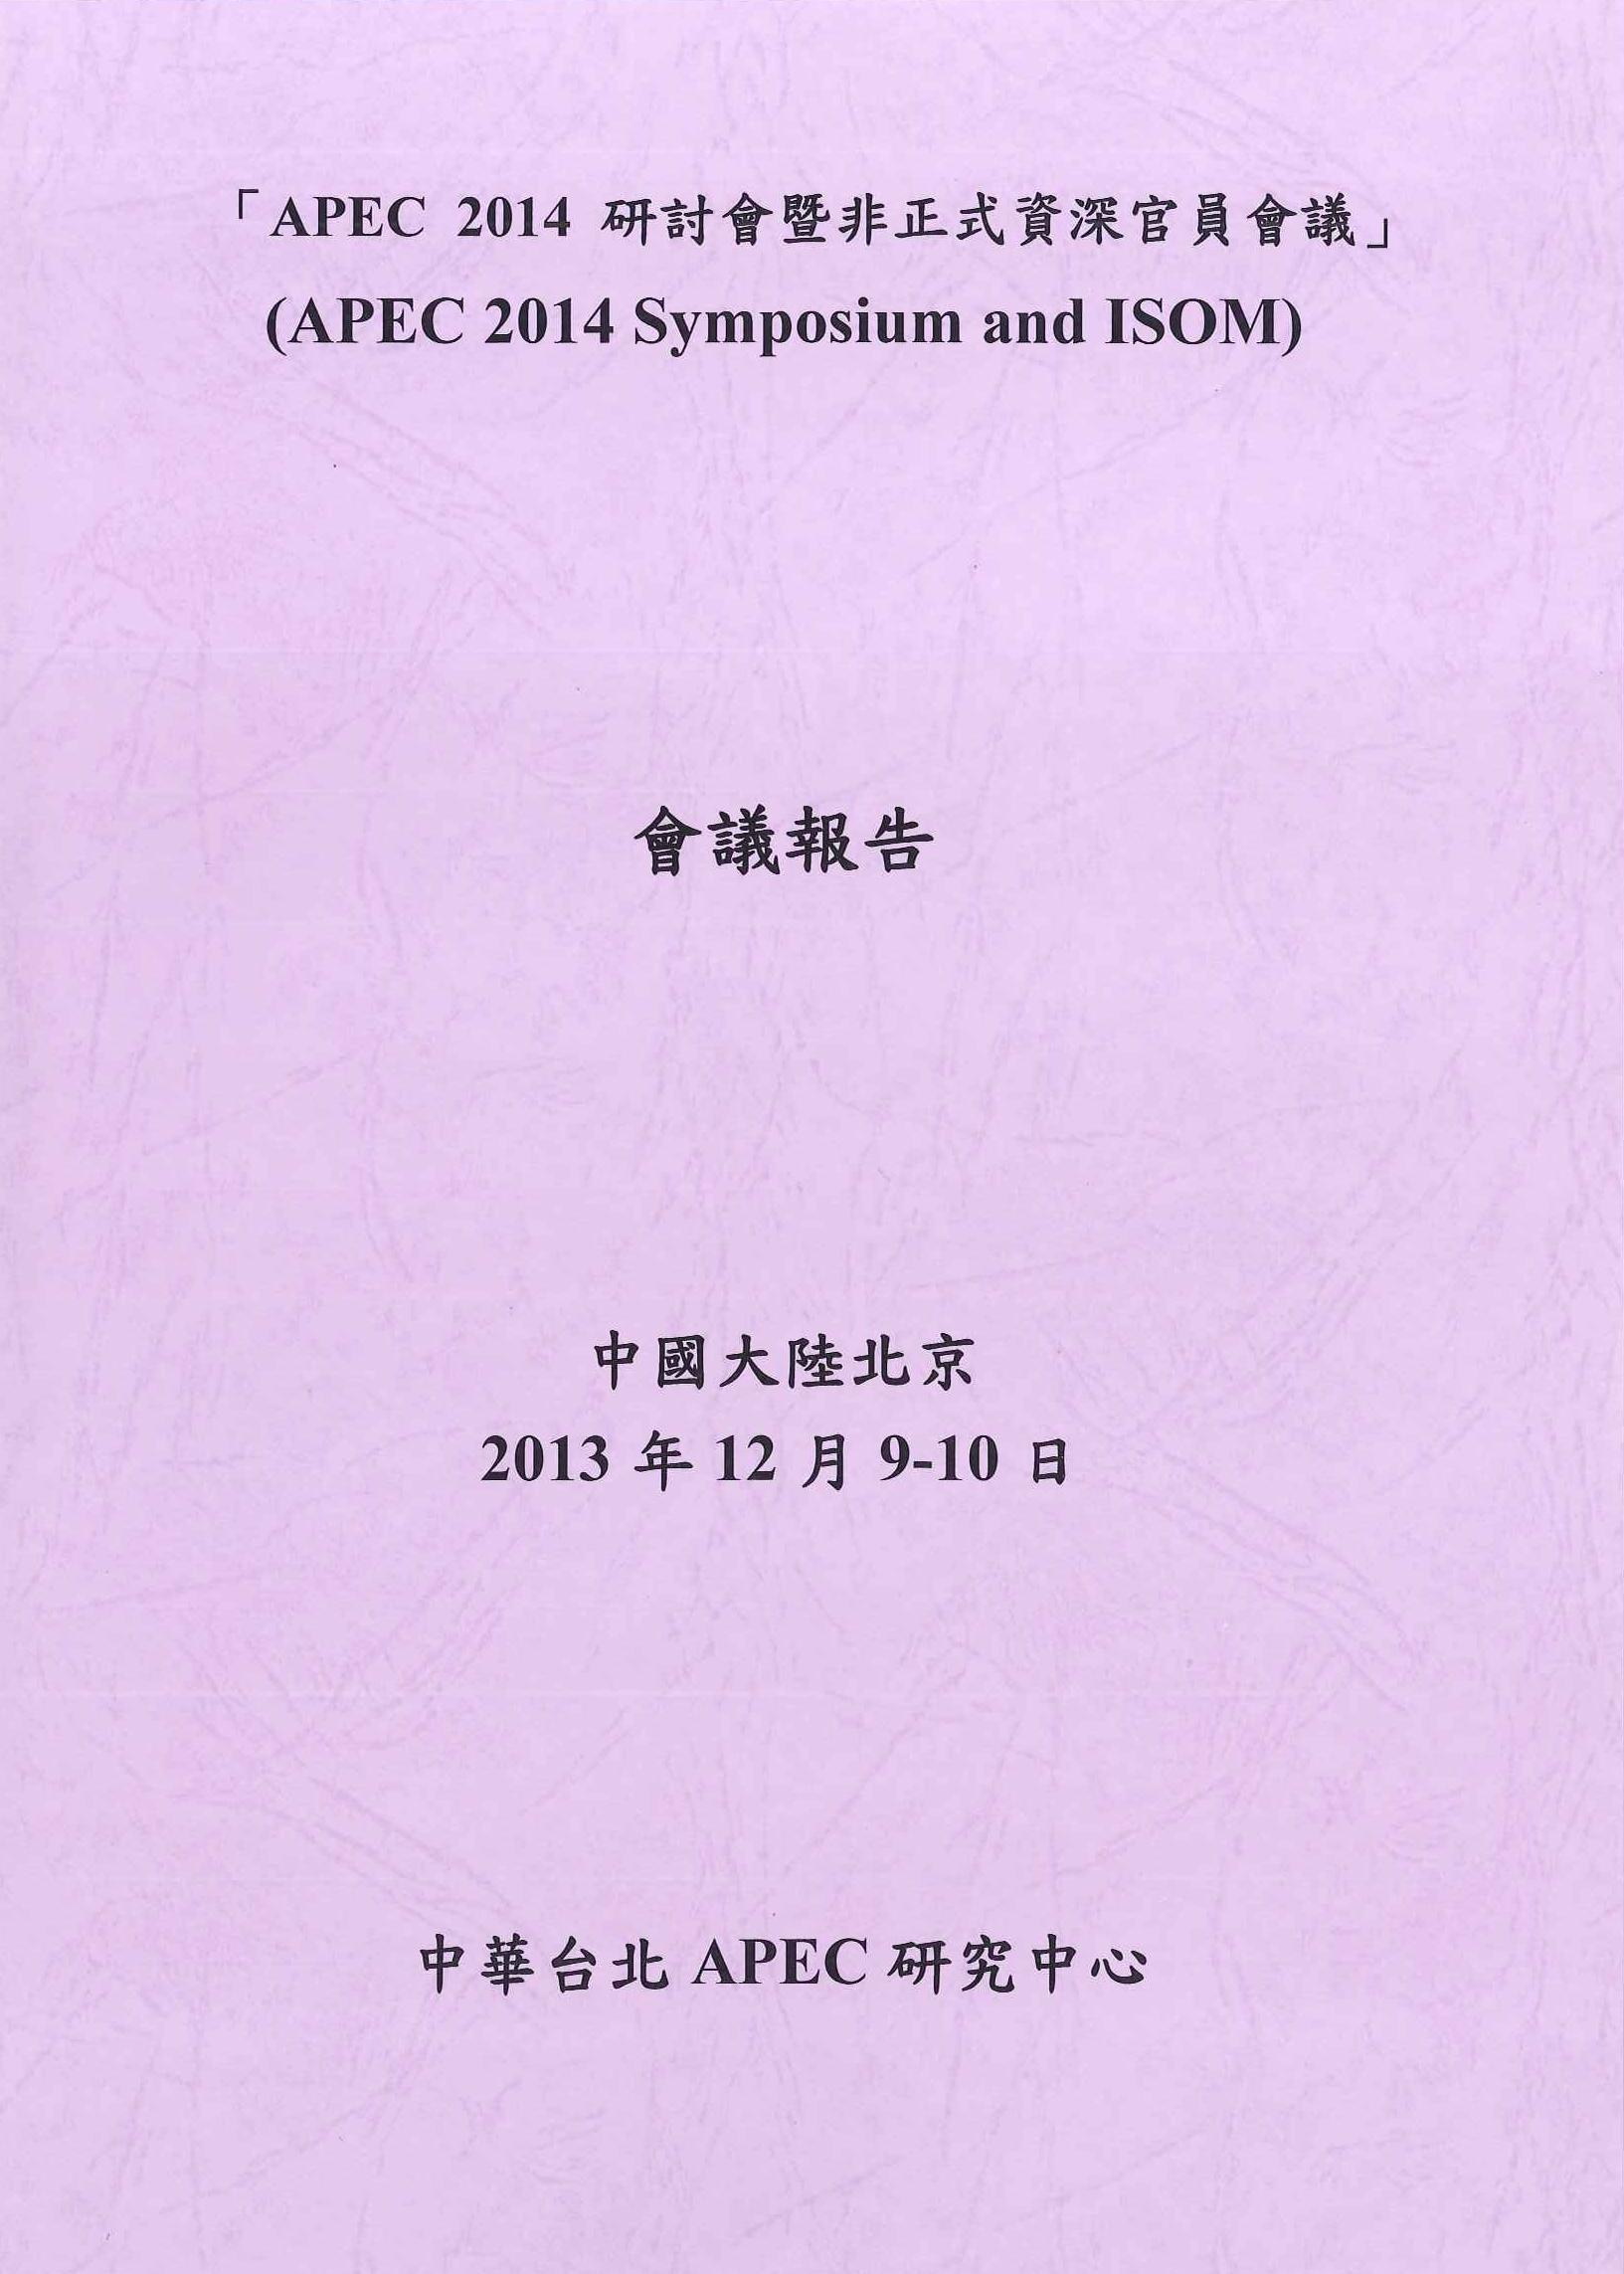 APEC 2014研討會暨非正式資深官員會議會議報告=APEC 2014 Symposium and ISOM